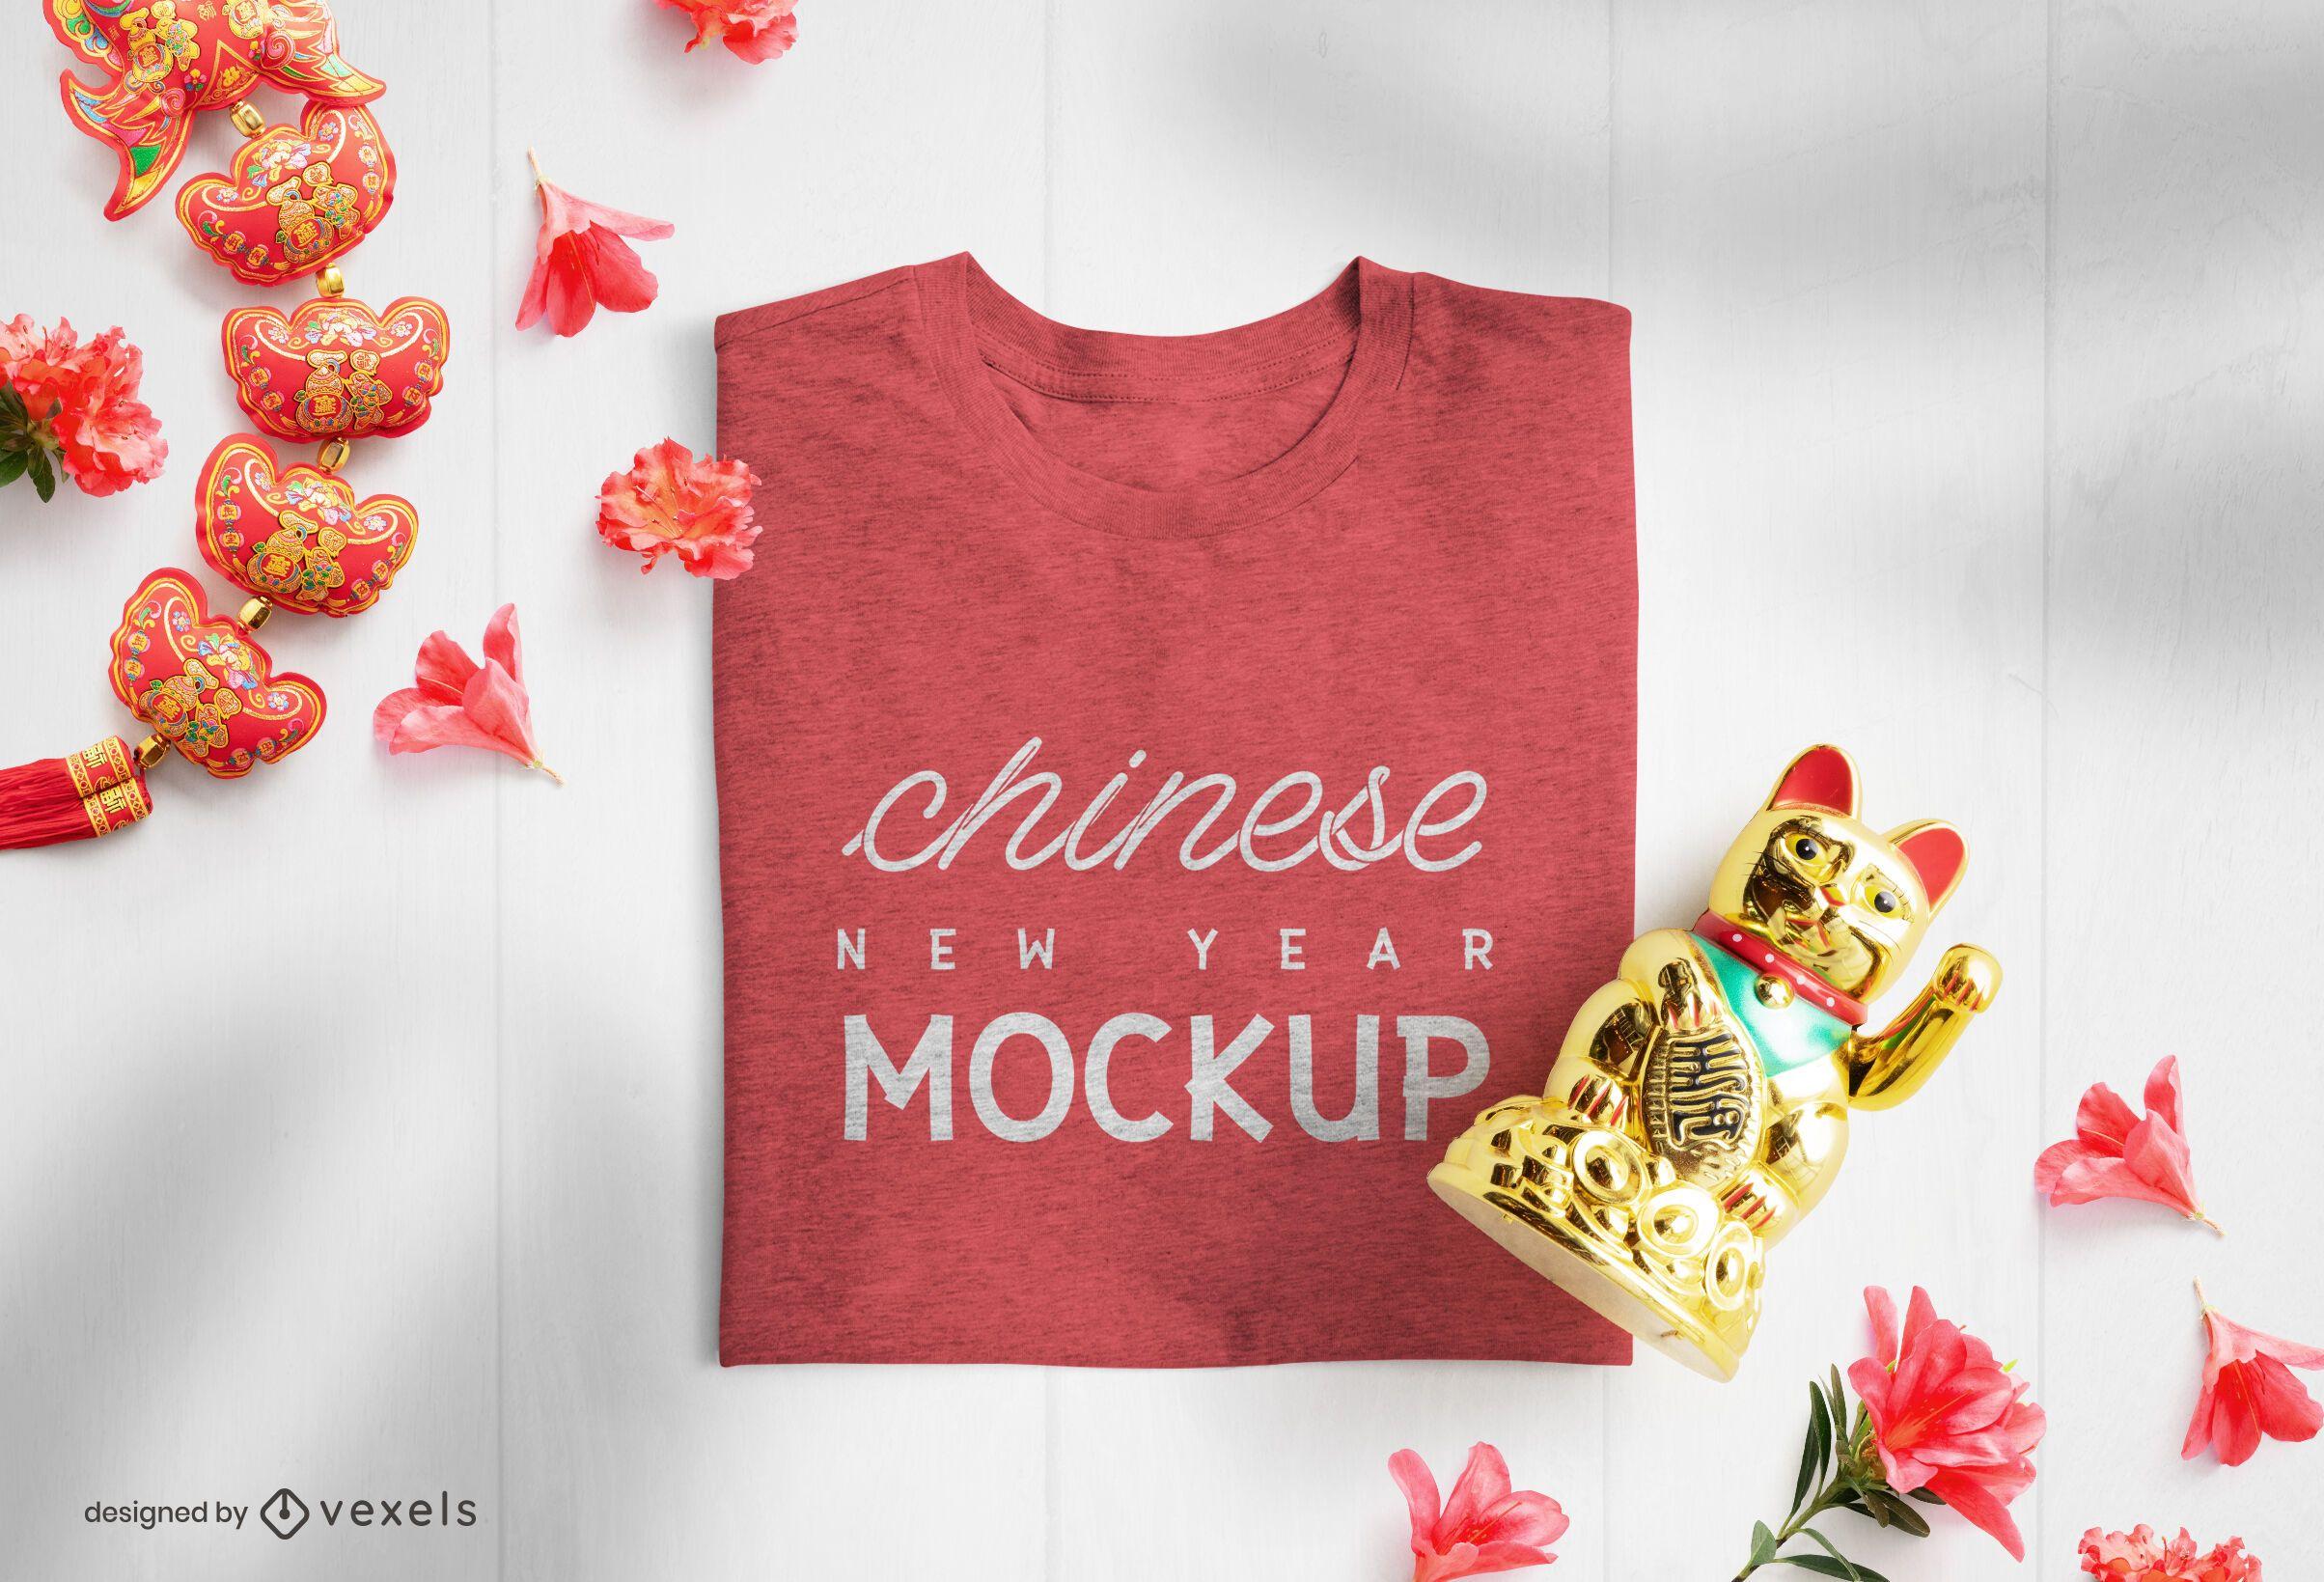 Composi??o da maquete de camiseta do ano novo chin?s